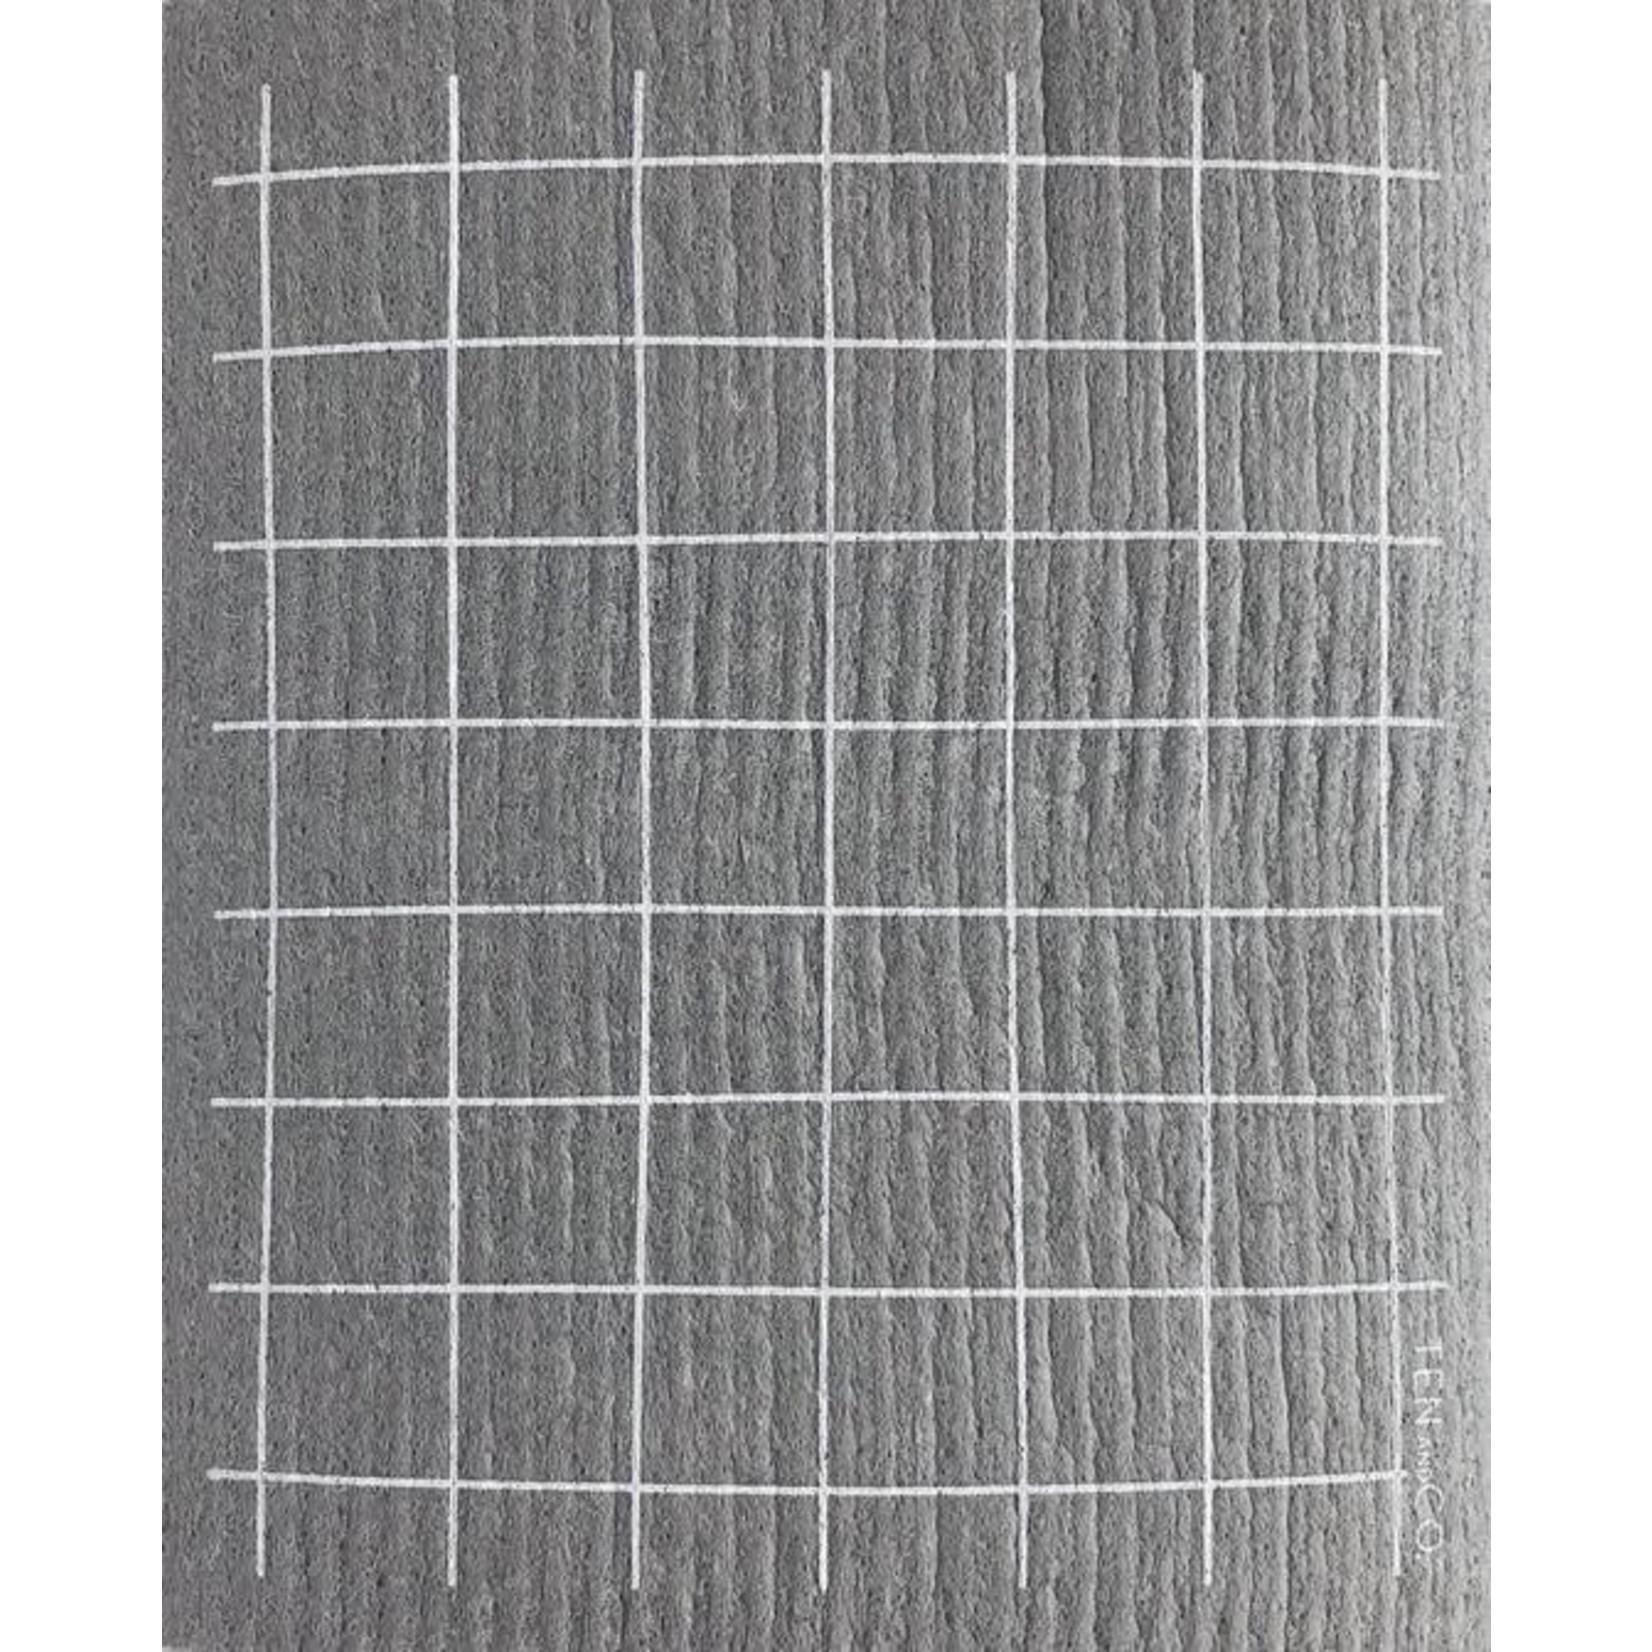 TEN AND CO. Sponge Cloth Grid Grey